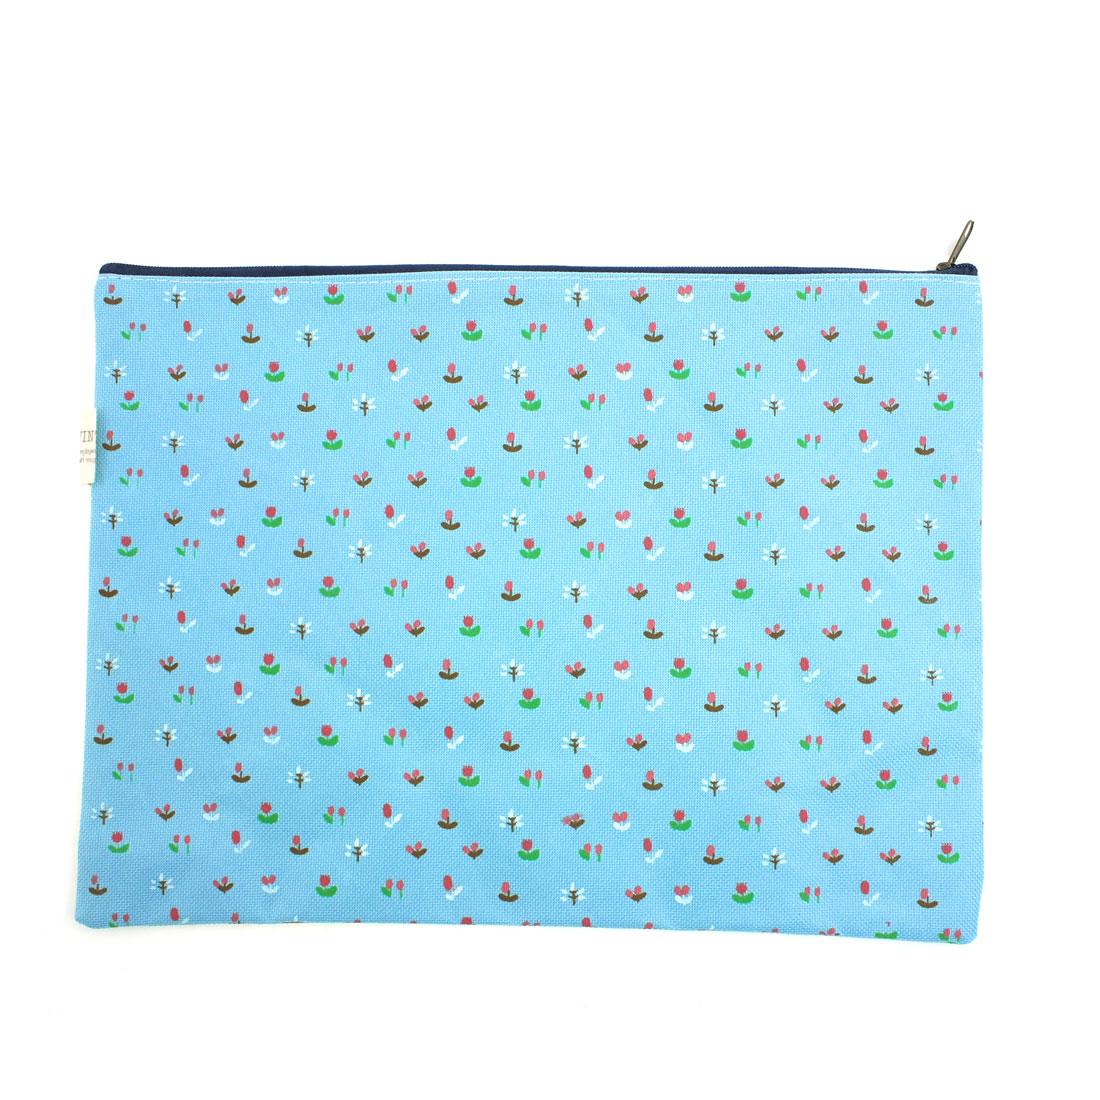 Flower Printed Zippered Paper Pens Organizer A4 File Bag Holder Blue